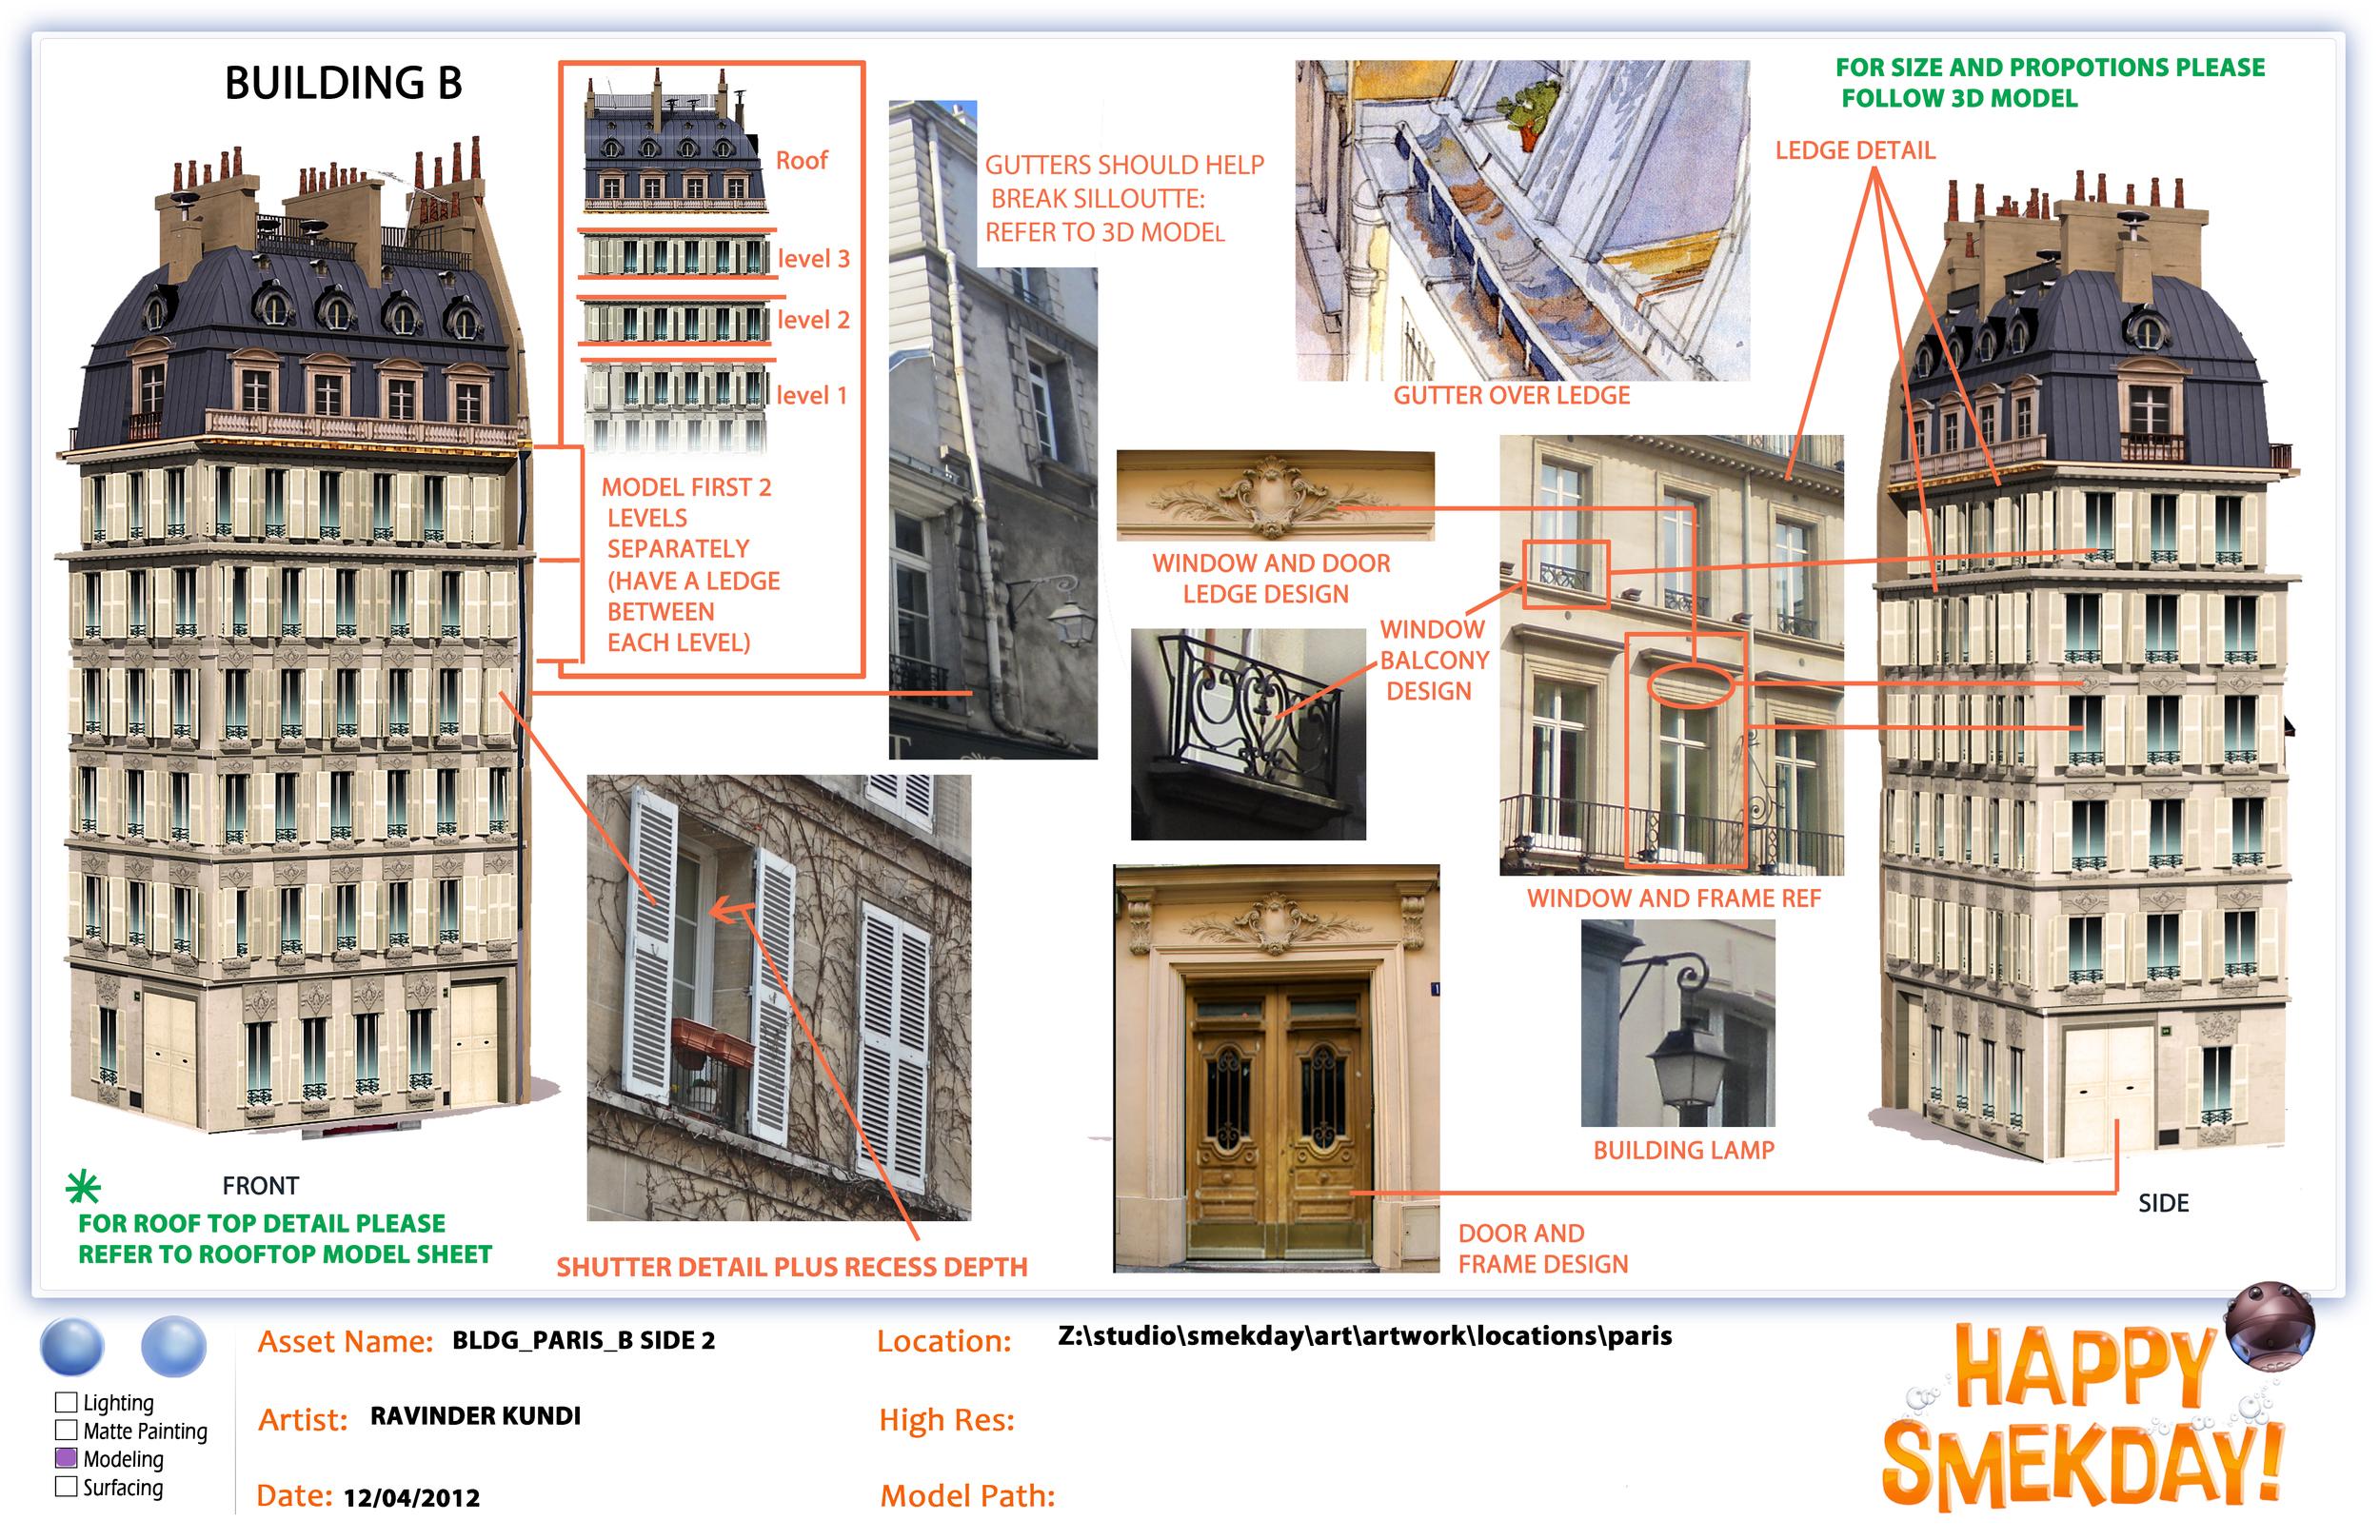 building_B_detail_01.jpg